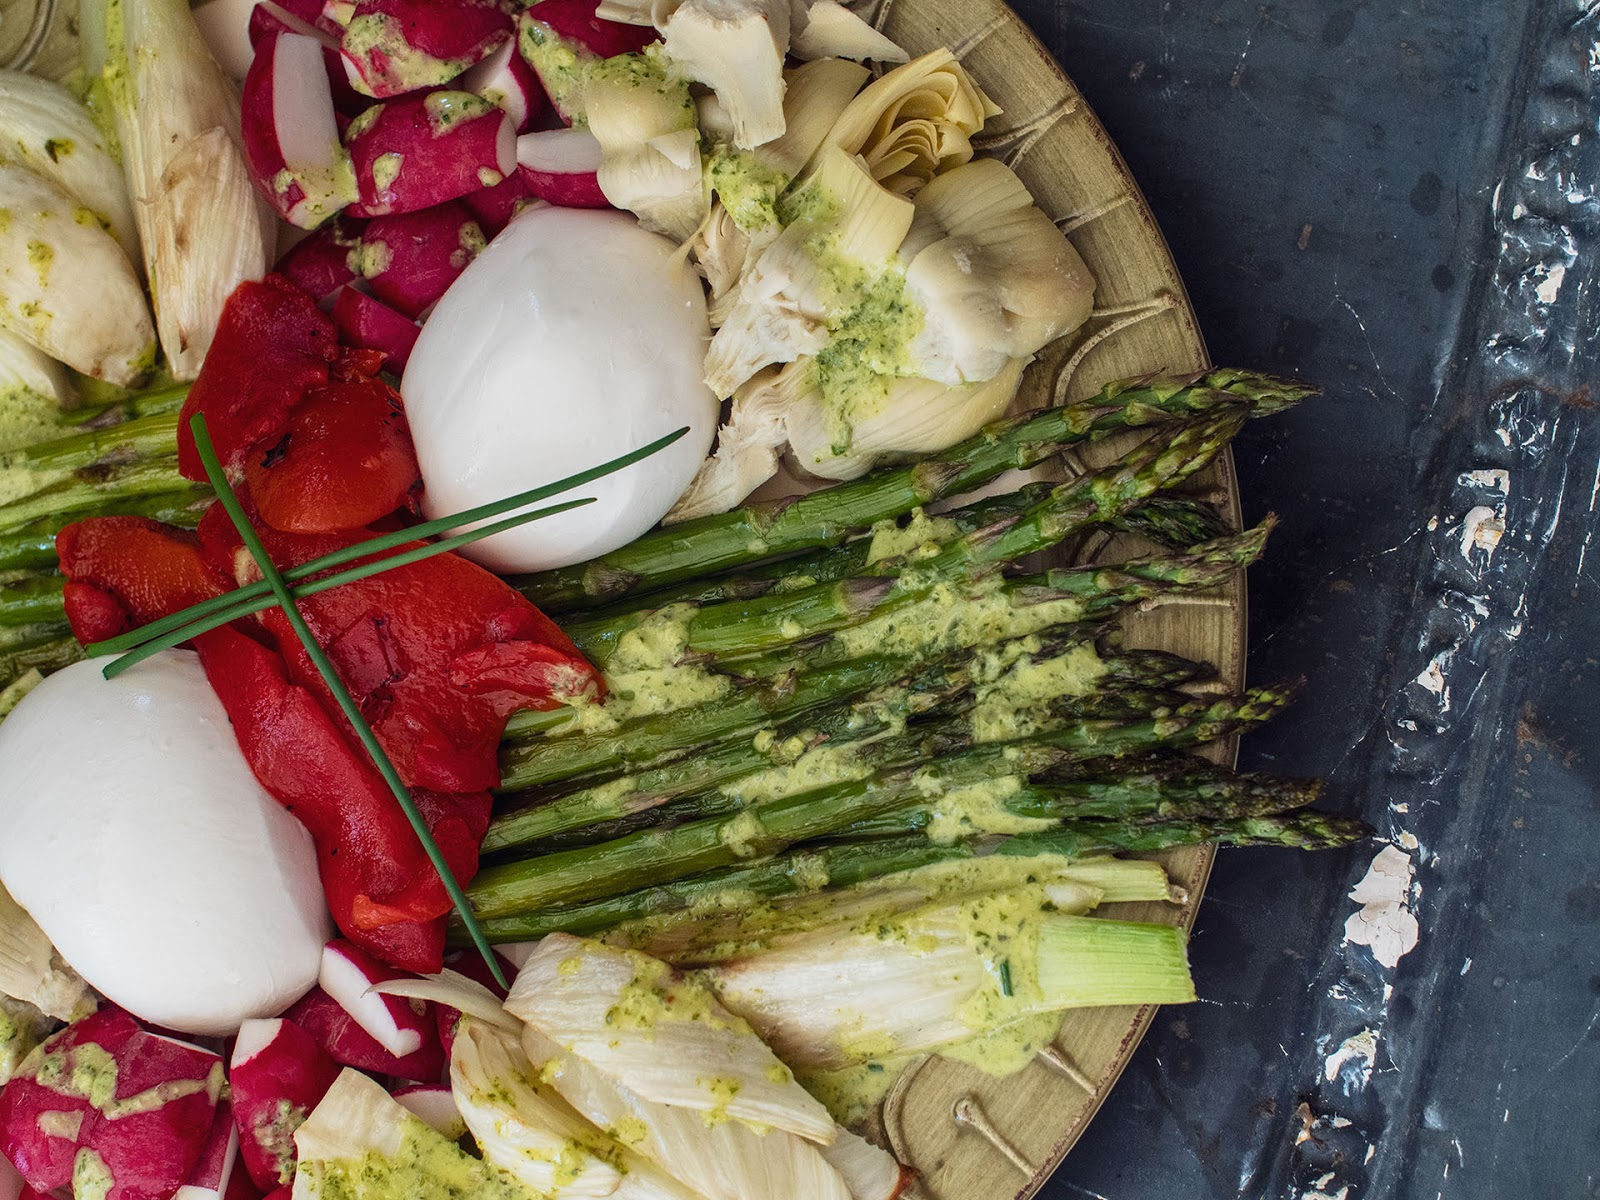 Spring Antipasto with burrata, roasted fennel, roasted asparagus | Local Food Rocks